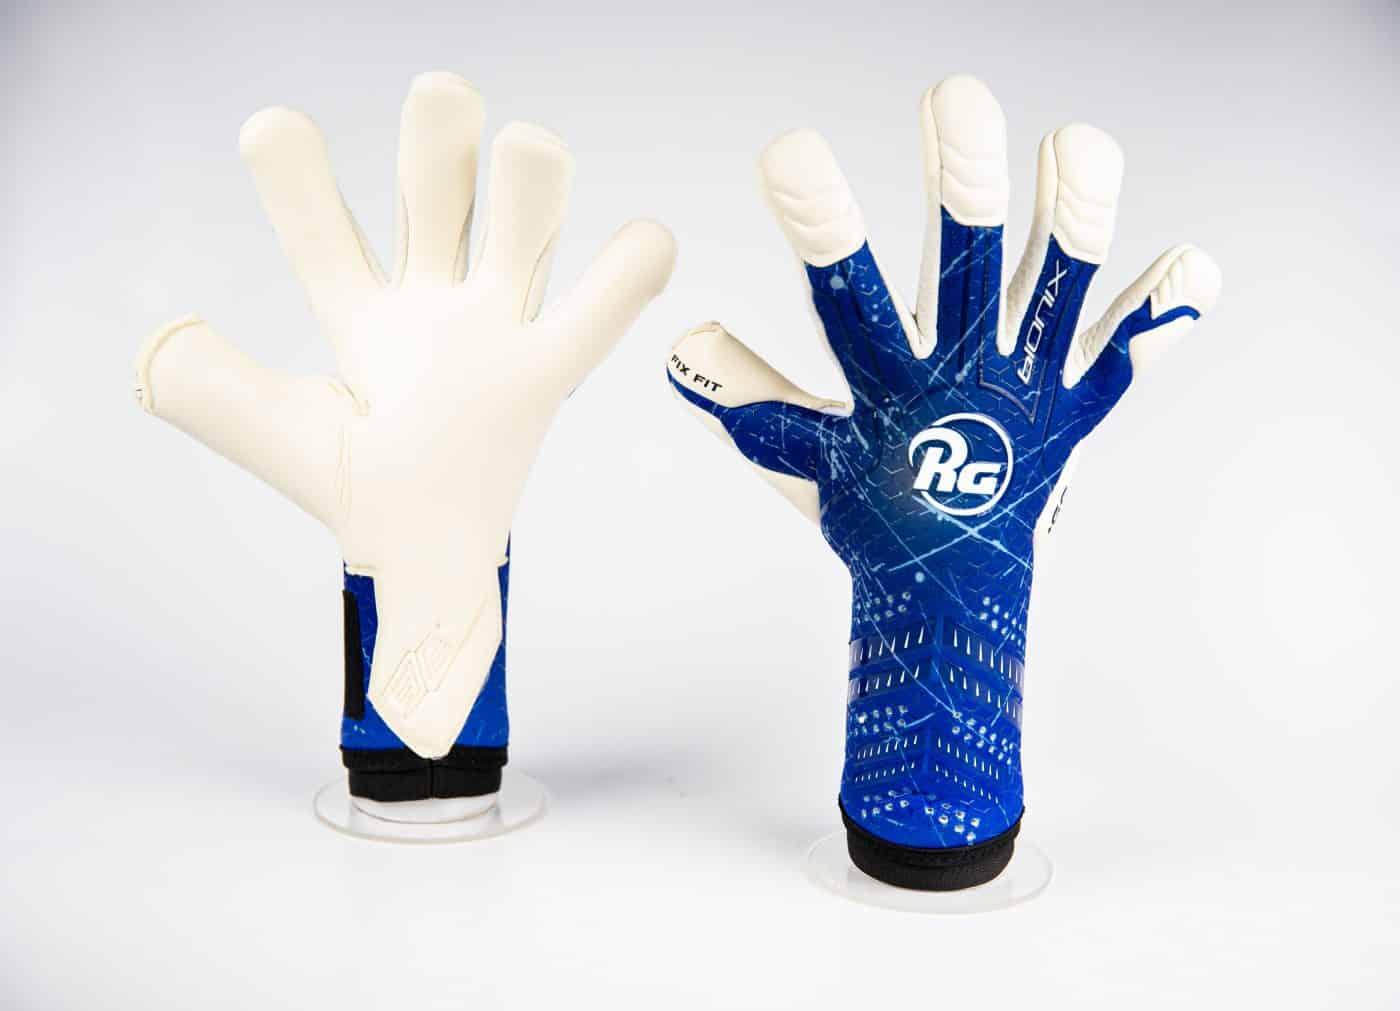 rg-bionix-blue-2020-rg-gloves-1